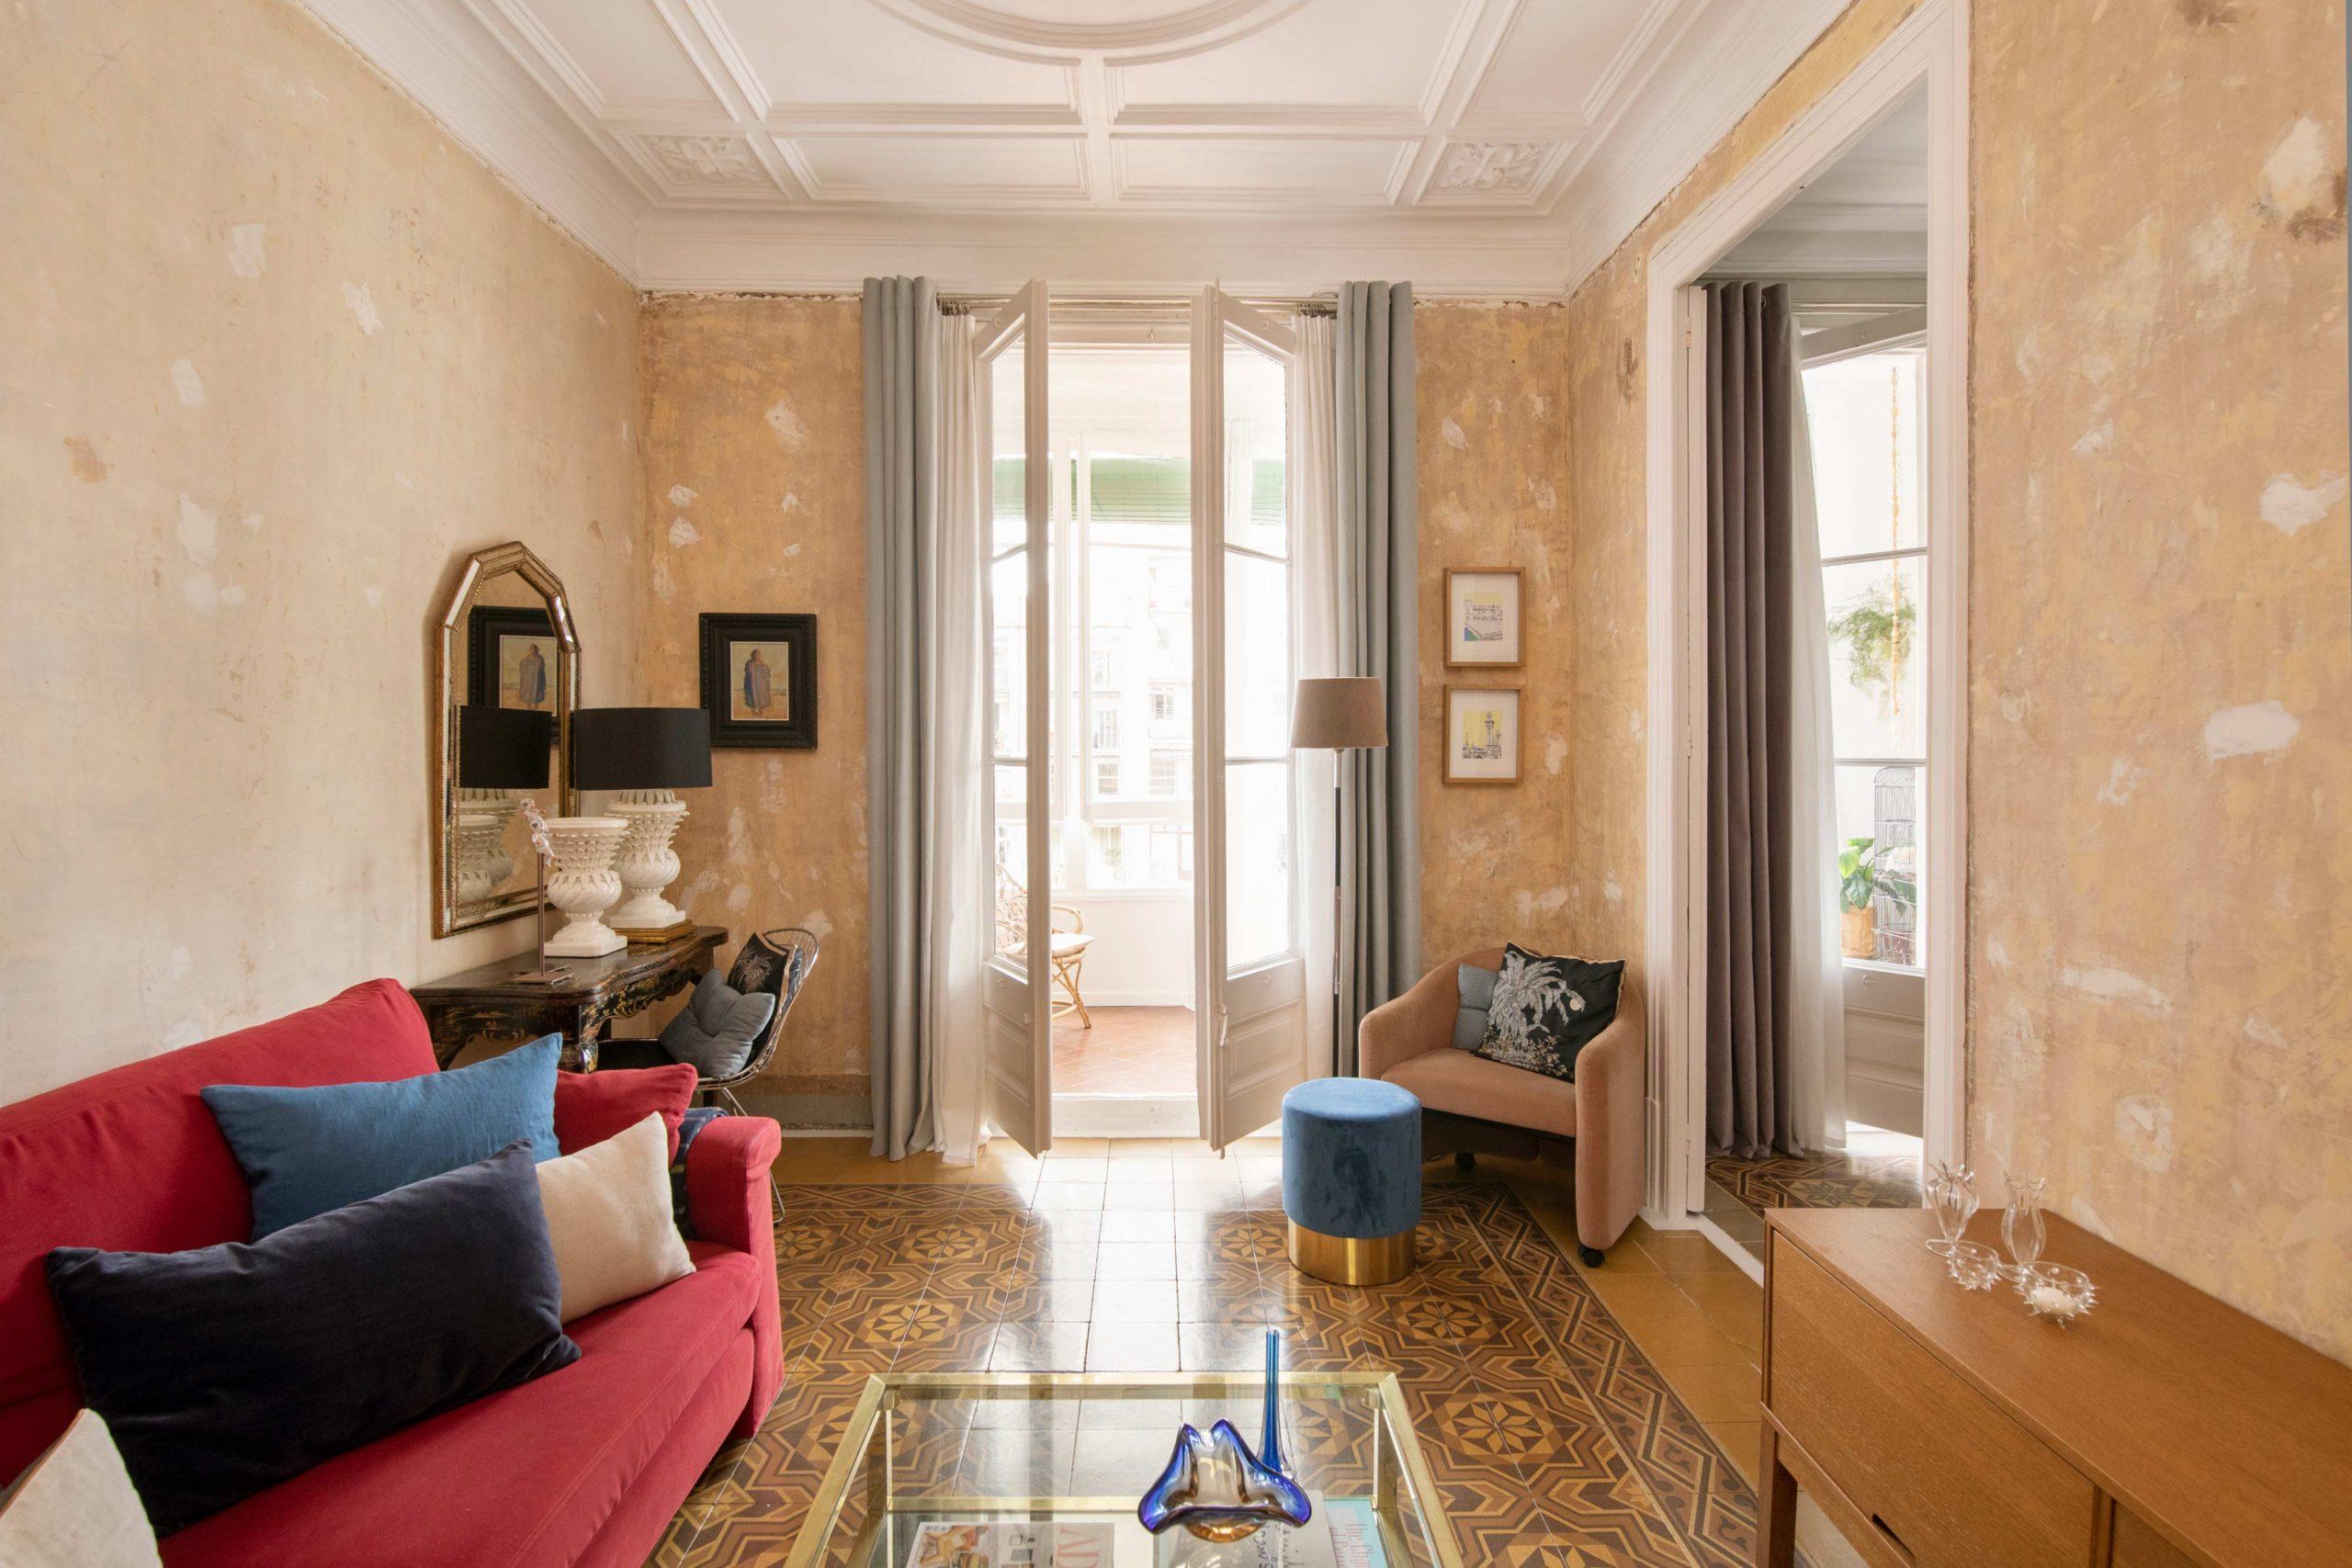 4fotografo-de-interiores-barcelona-lintrepideAD